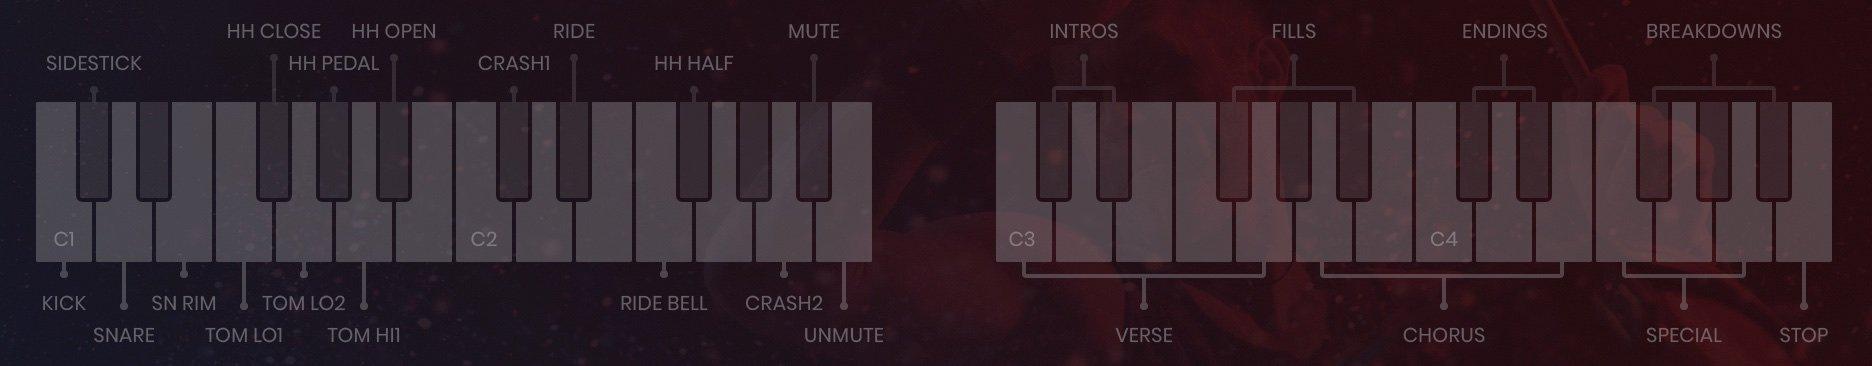 UJAM Virtual Drummer: Batterie Virtuali pronte all'uso